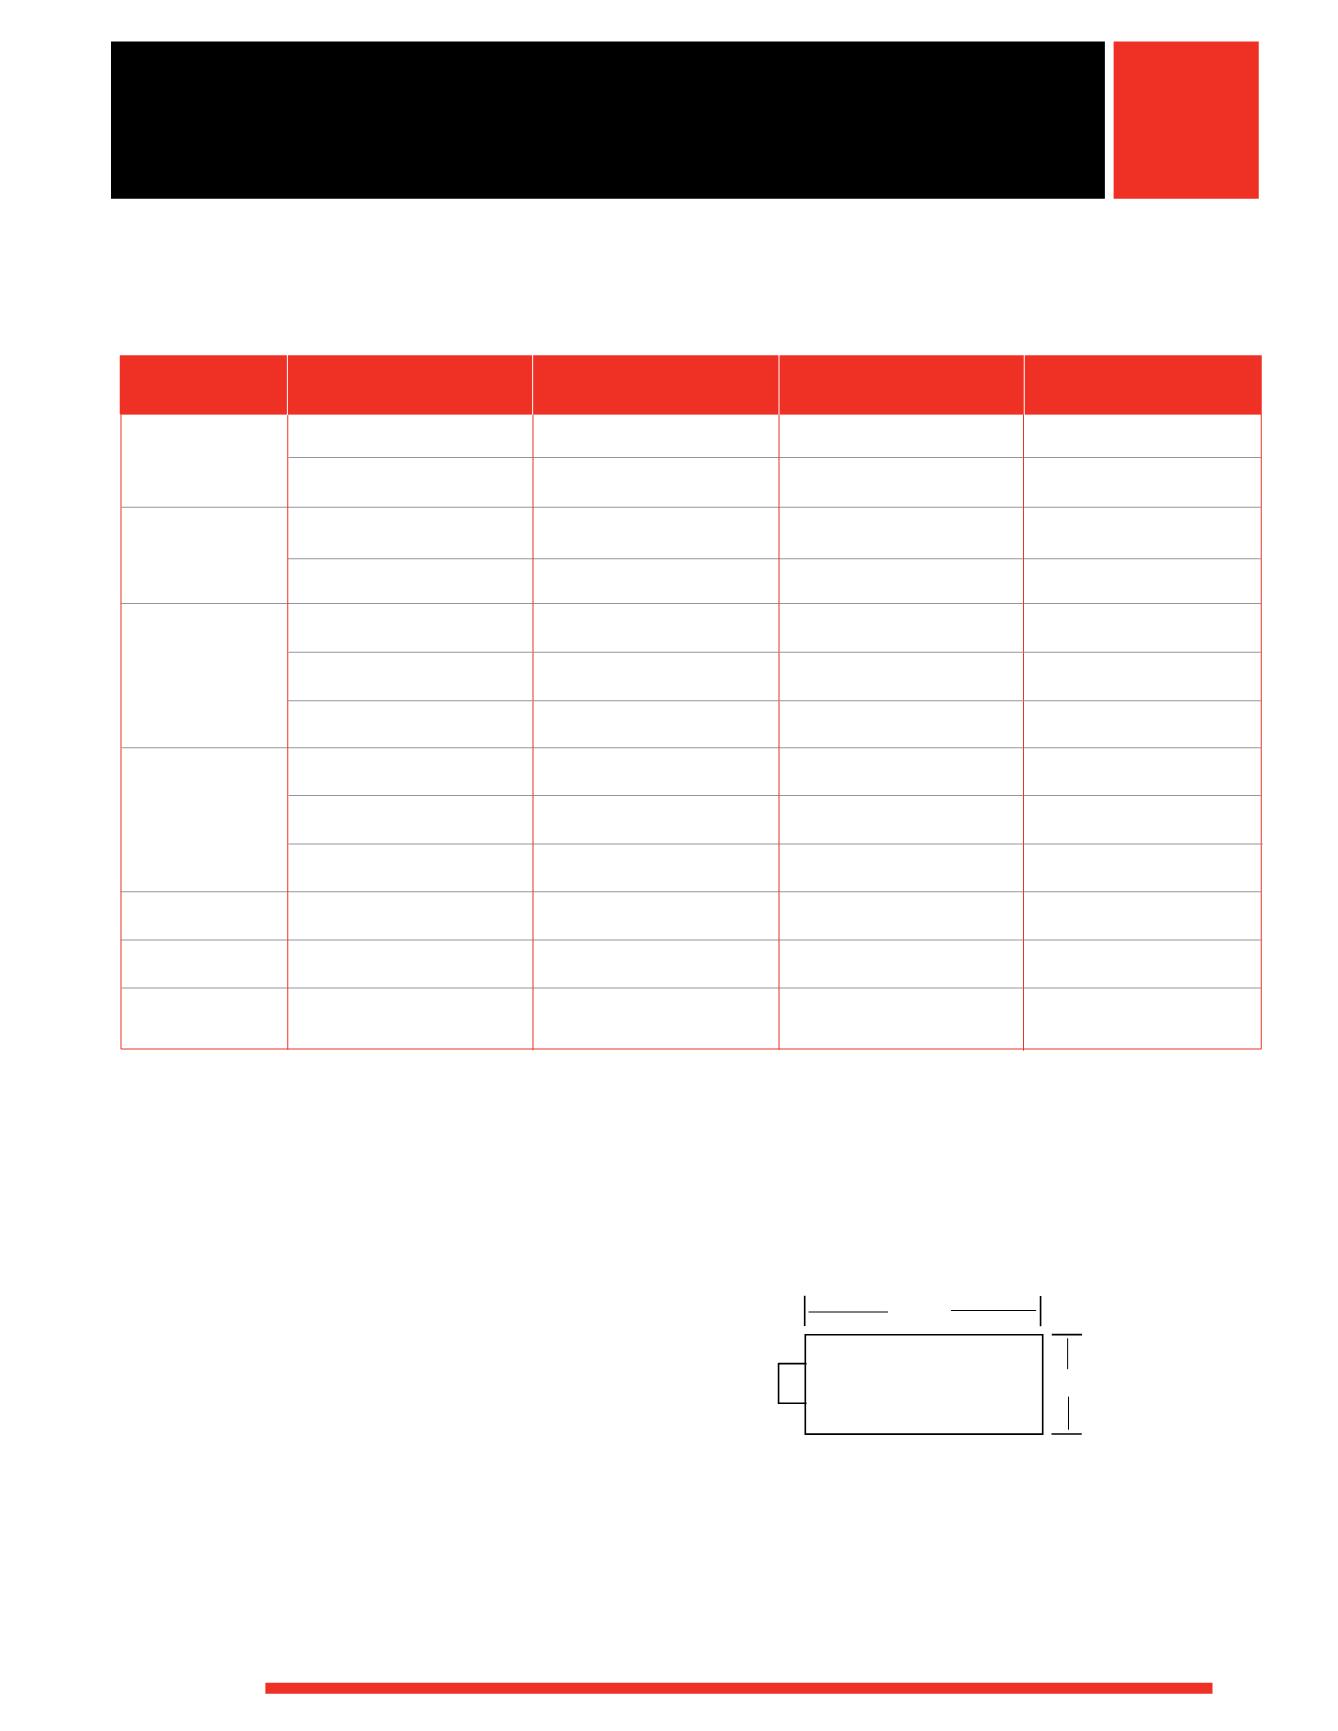 watlow heater wiring diagram chromalox heater wiring